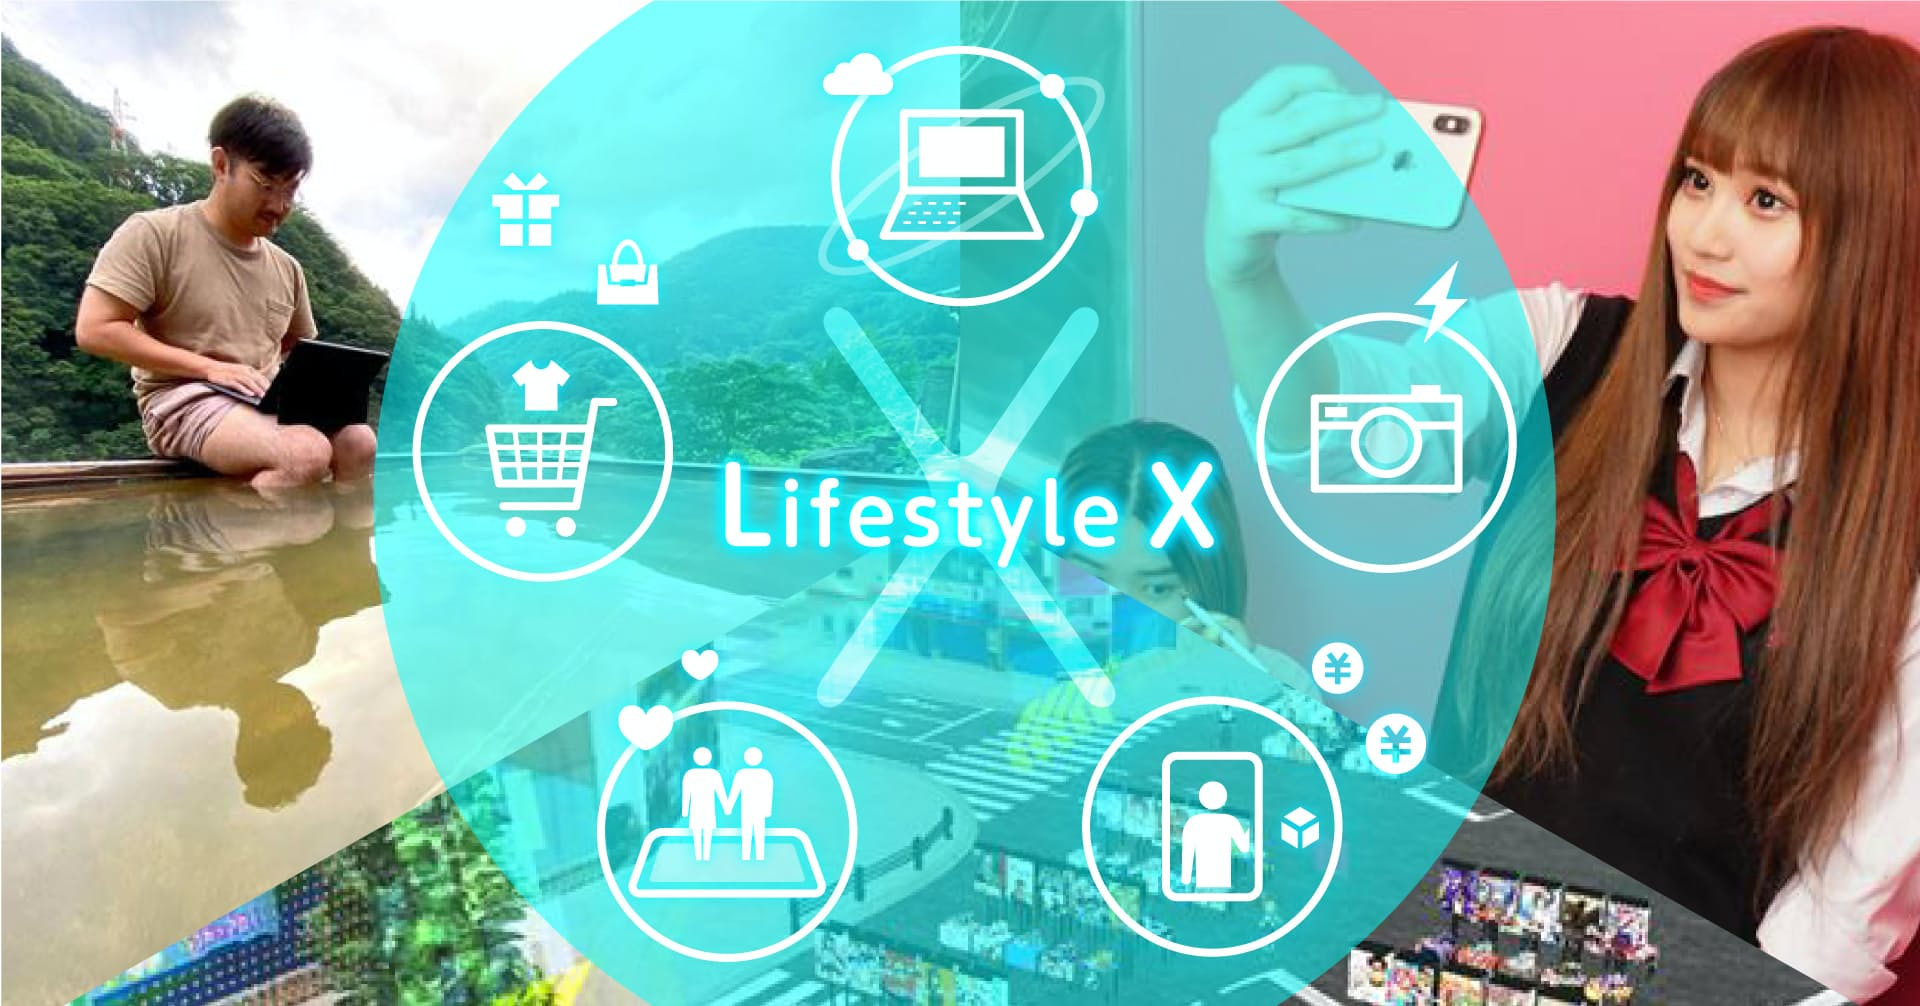 Lifestyle X